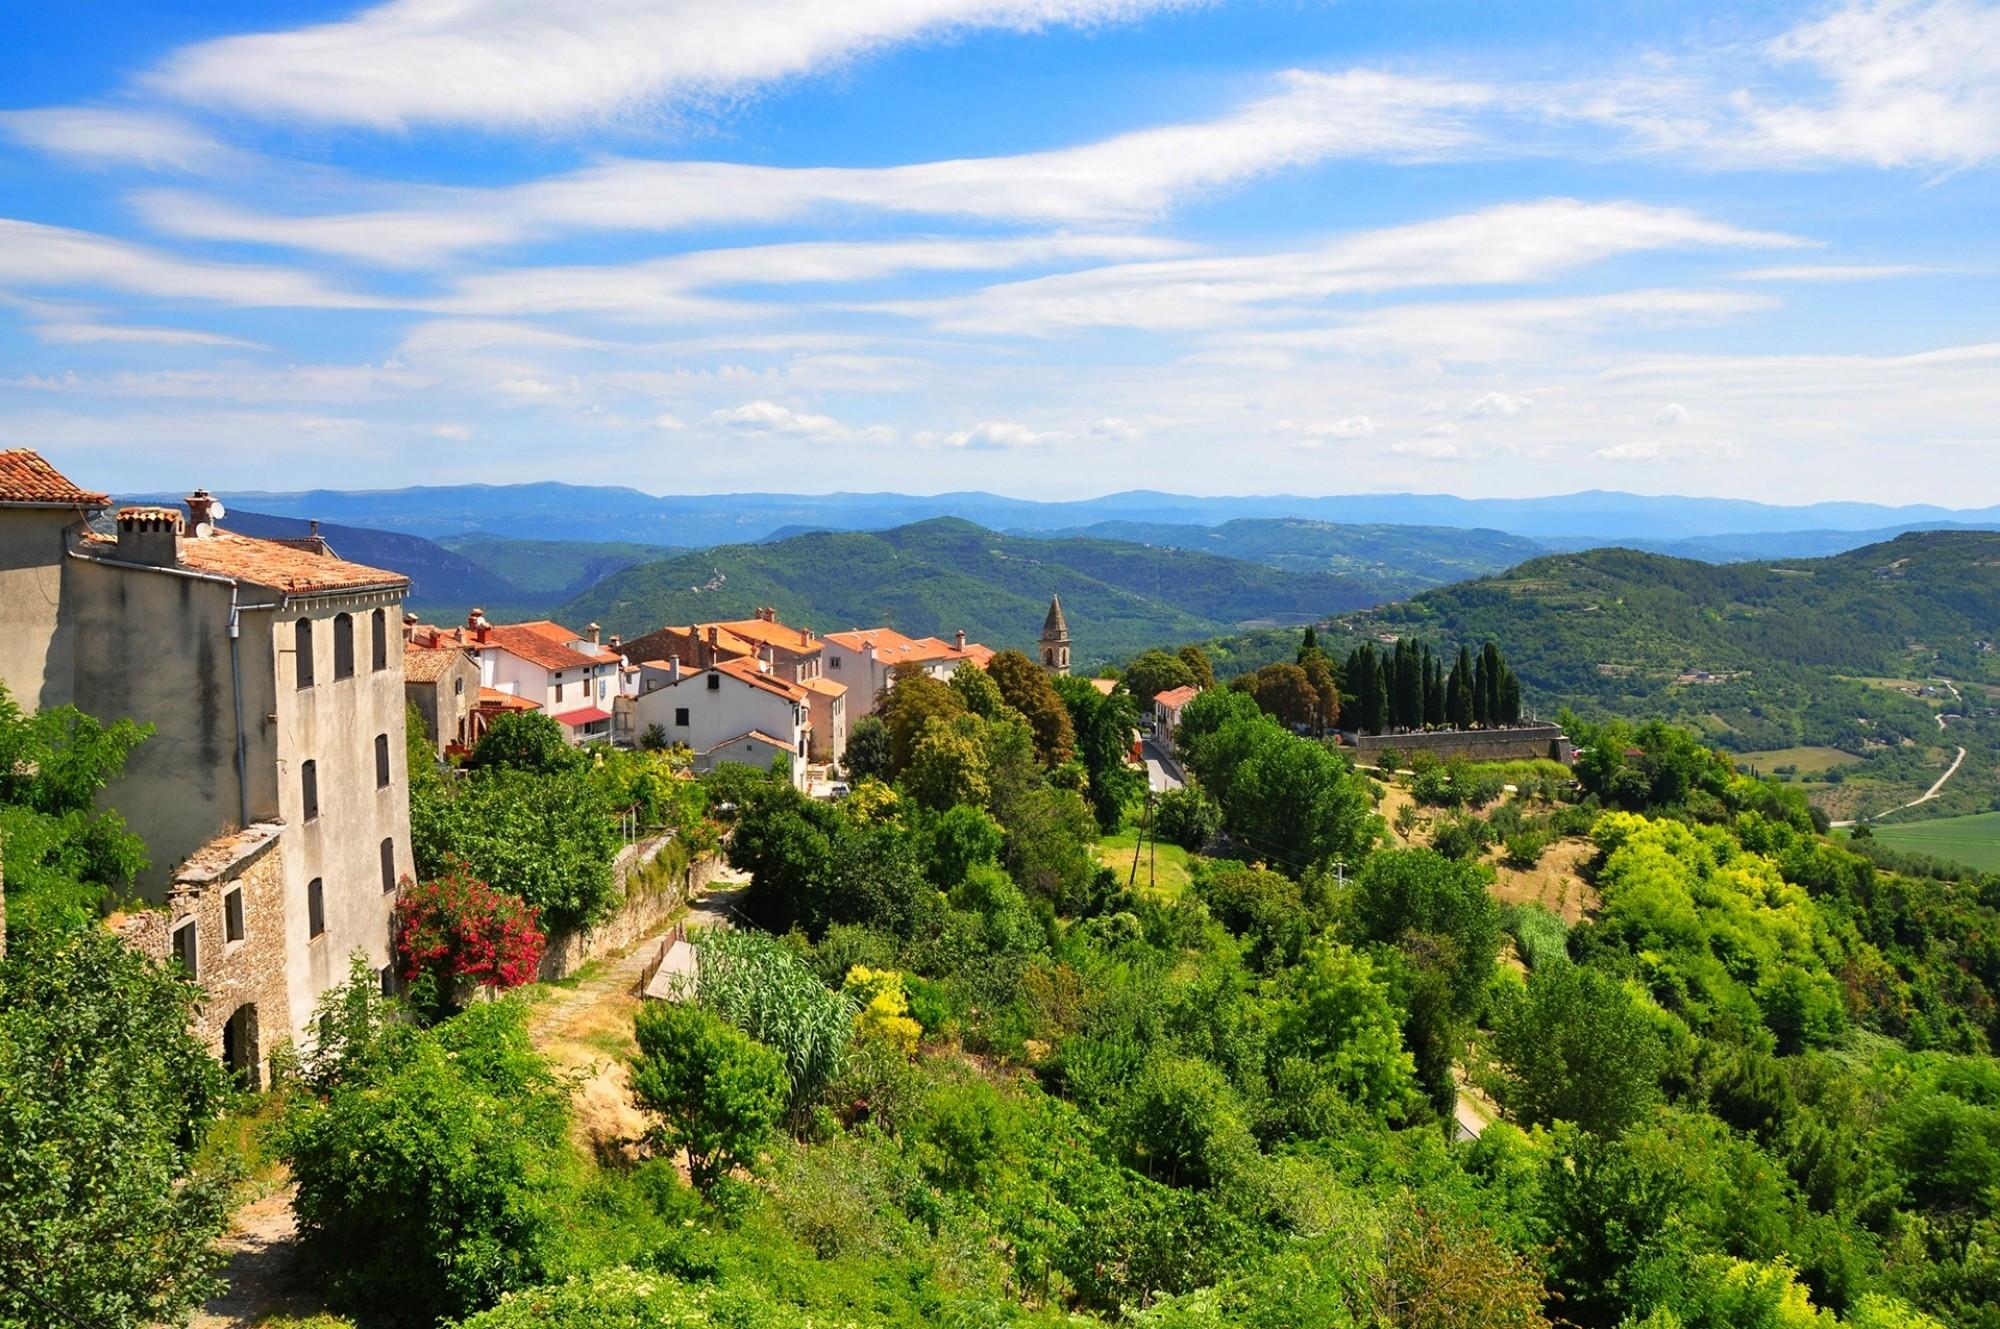 View-from-Motovun_shutterstock_702331462_sangriana